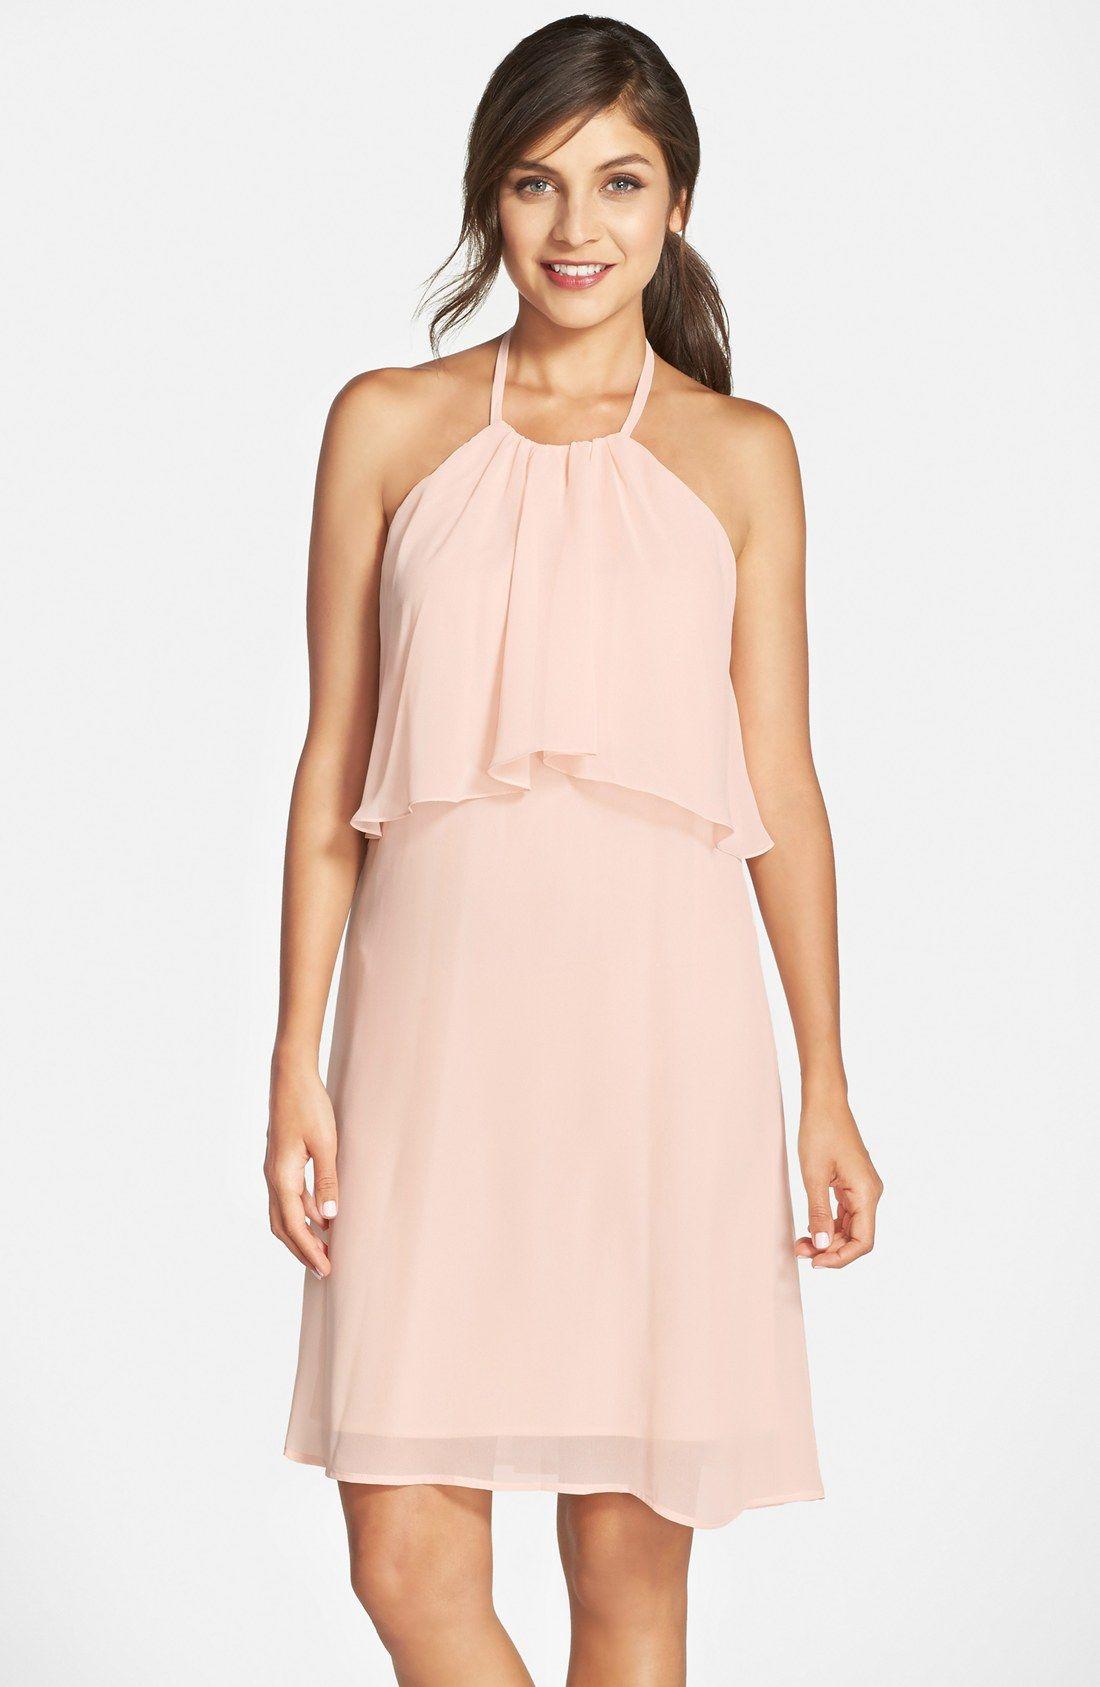 nouvelle AMSALE Chiffon Halter Dress | для дела | Pinterest